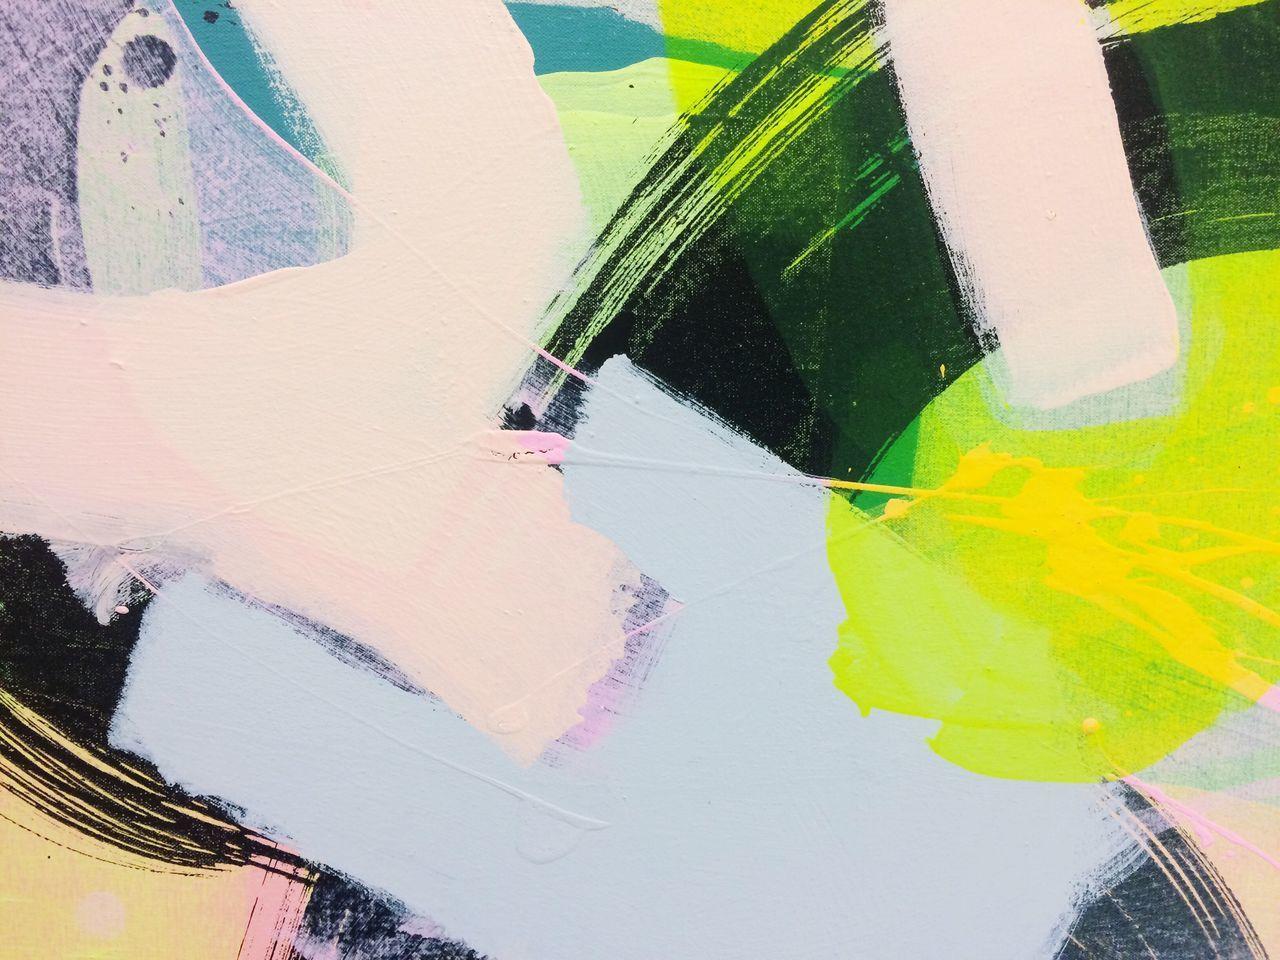 Brush strokes on canvas